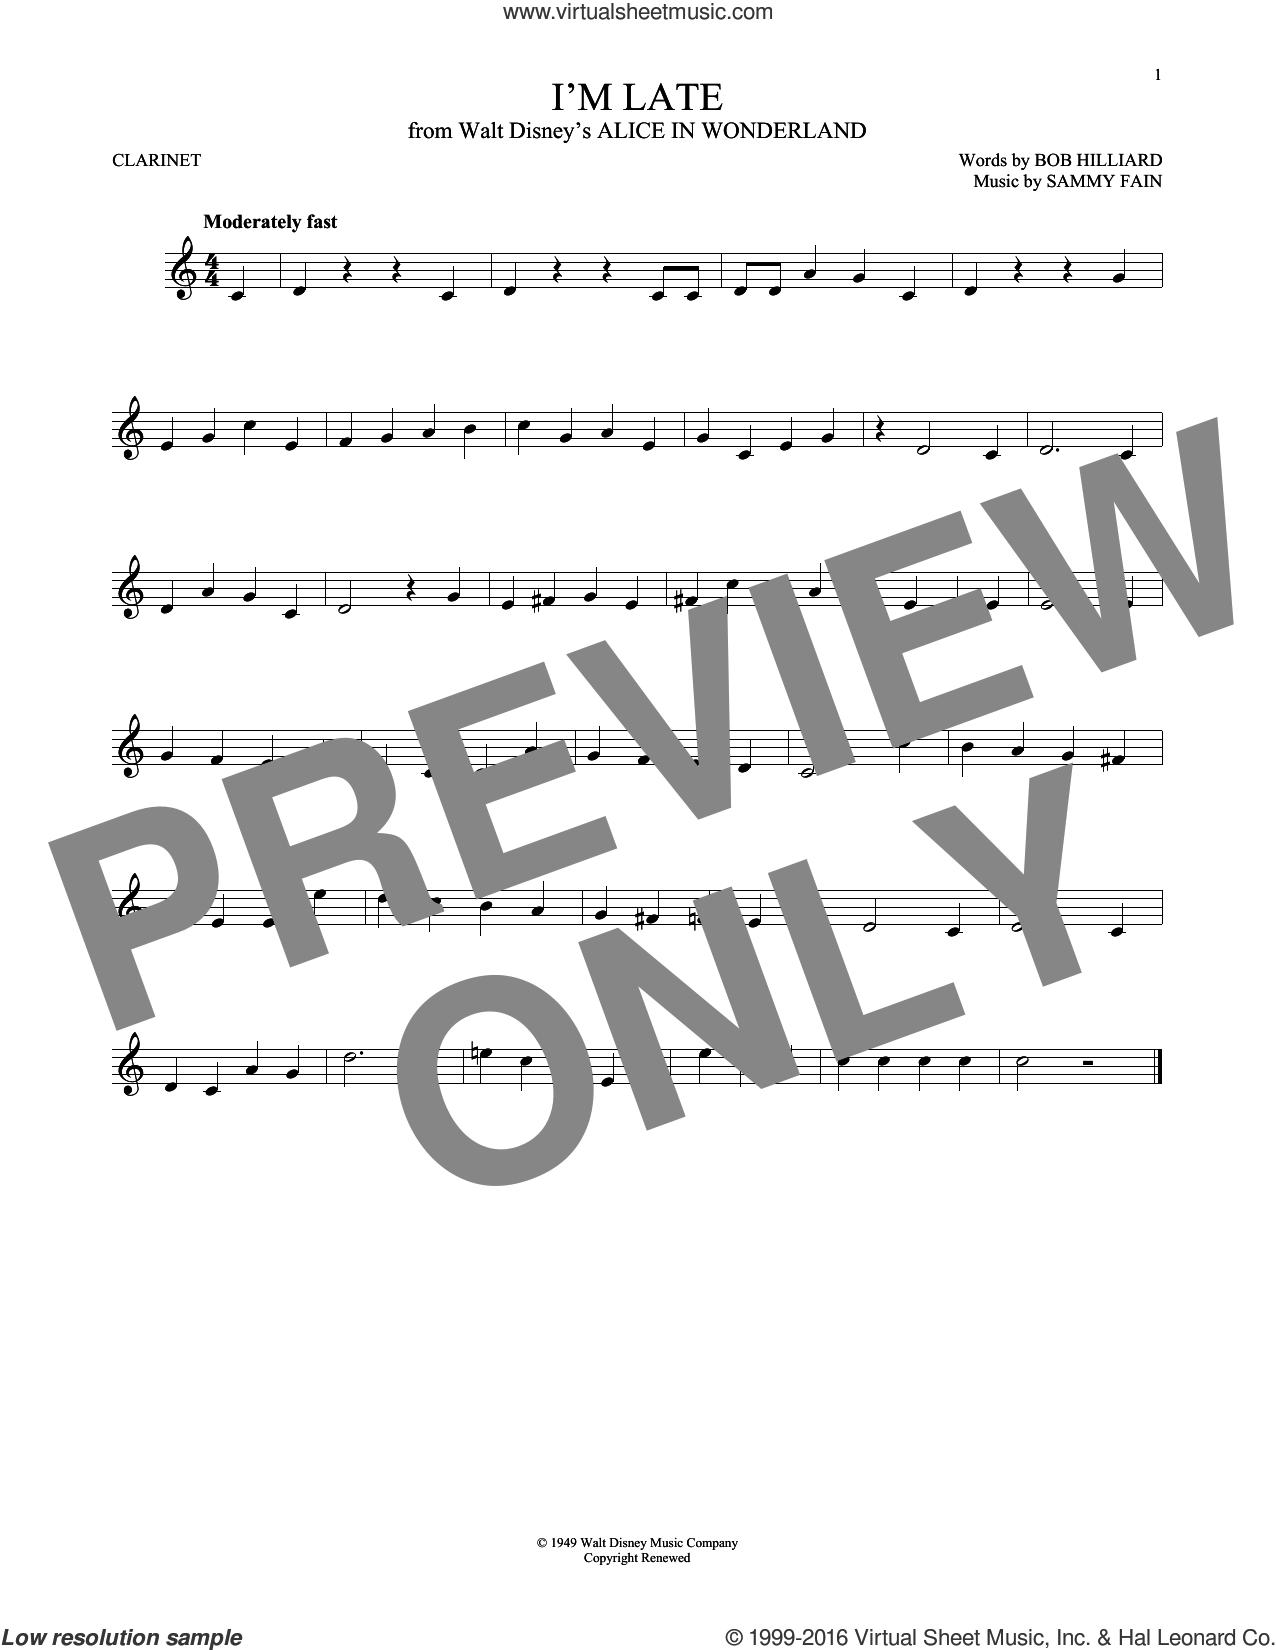 I'm Late sheet music for clarinet solo by Sammy Fain and Bob Hilliard, intermediate skill level